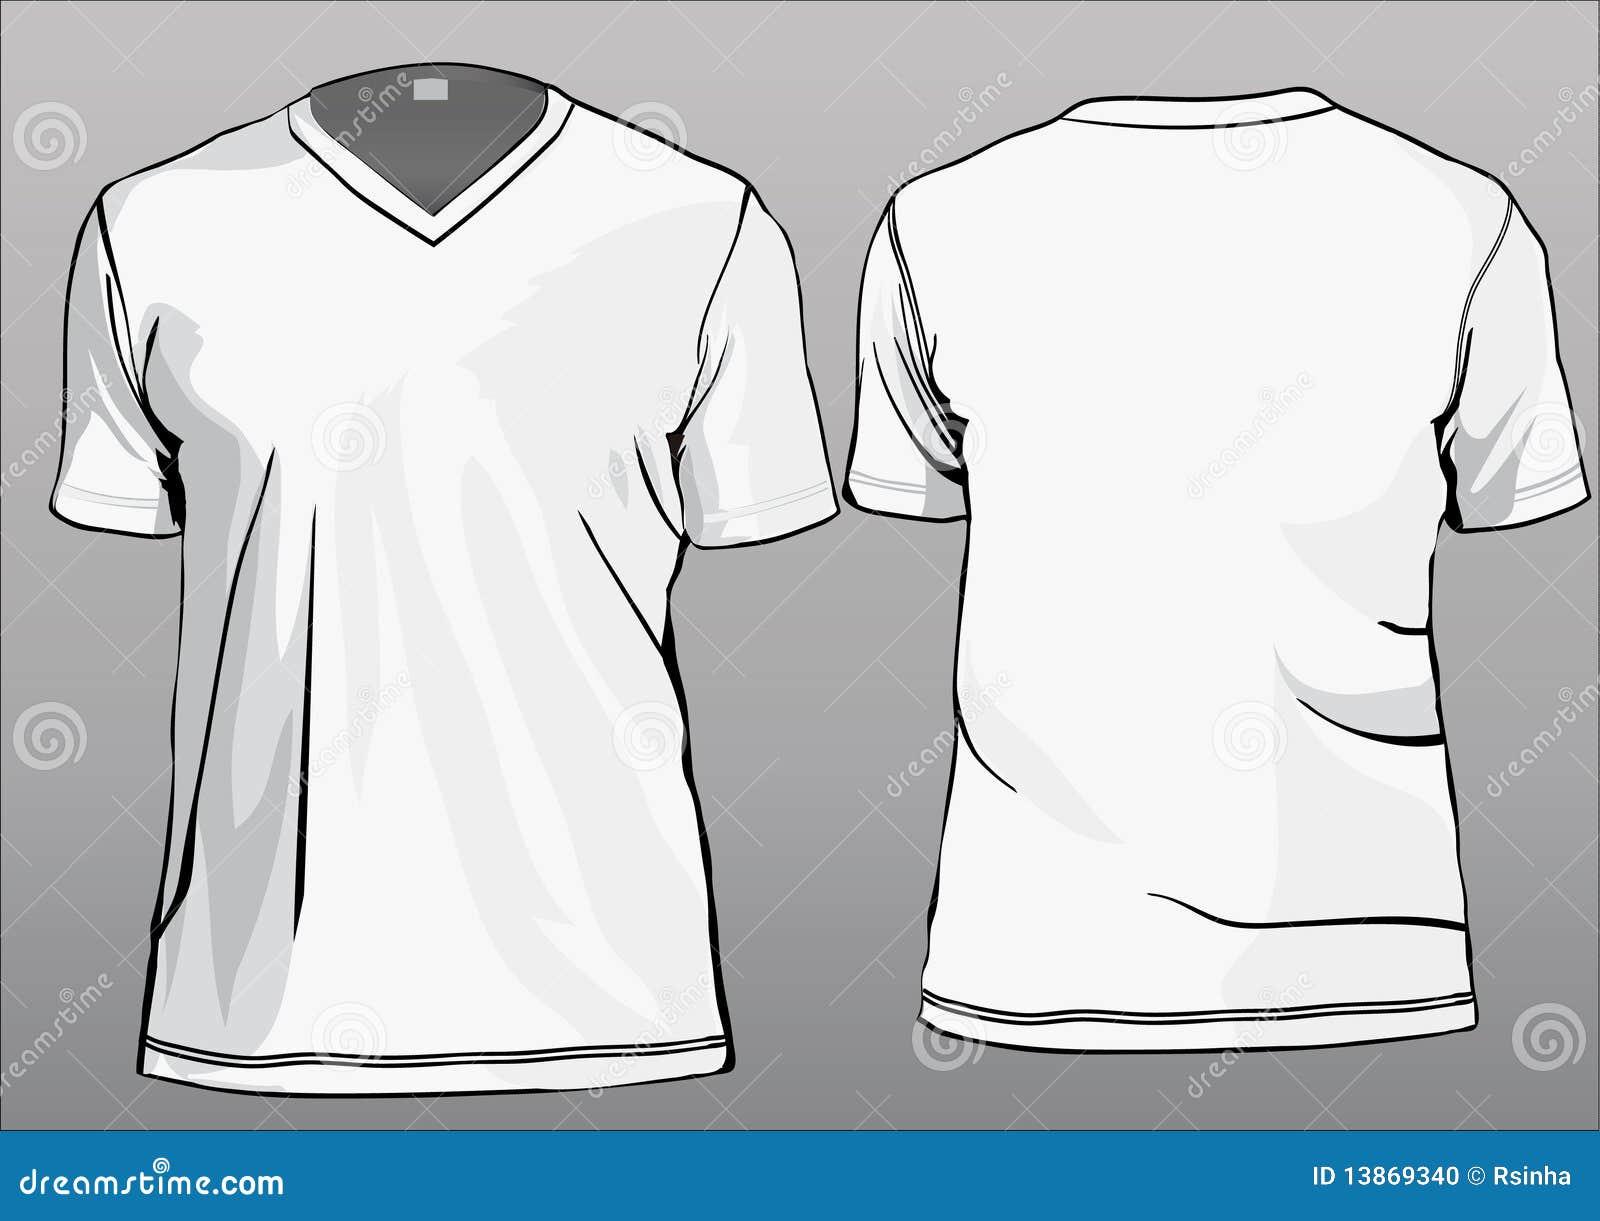 tshirt template with v neck stock vector illustration of uniform printing 13869340. Black Bedroom Furniture Sets. Home Design Ideas